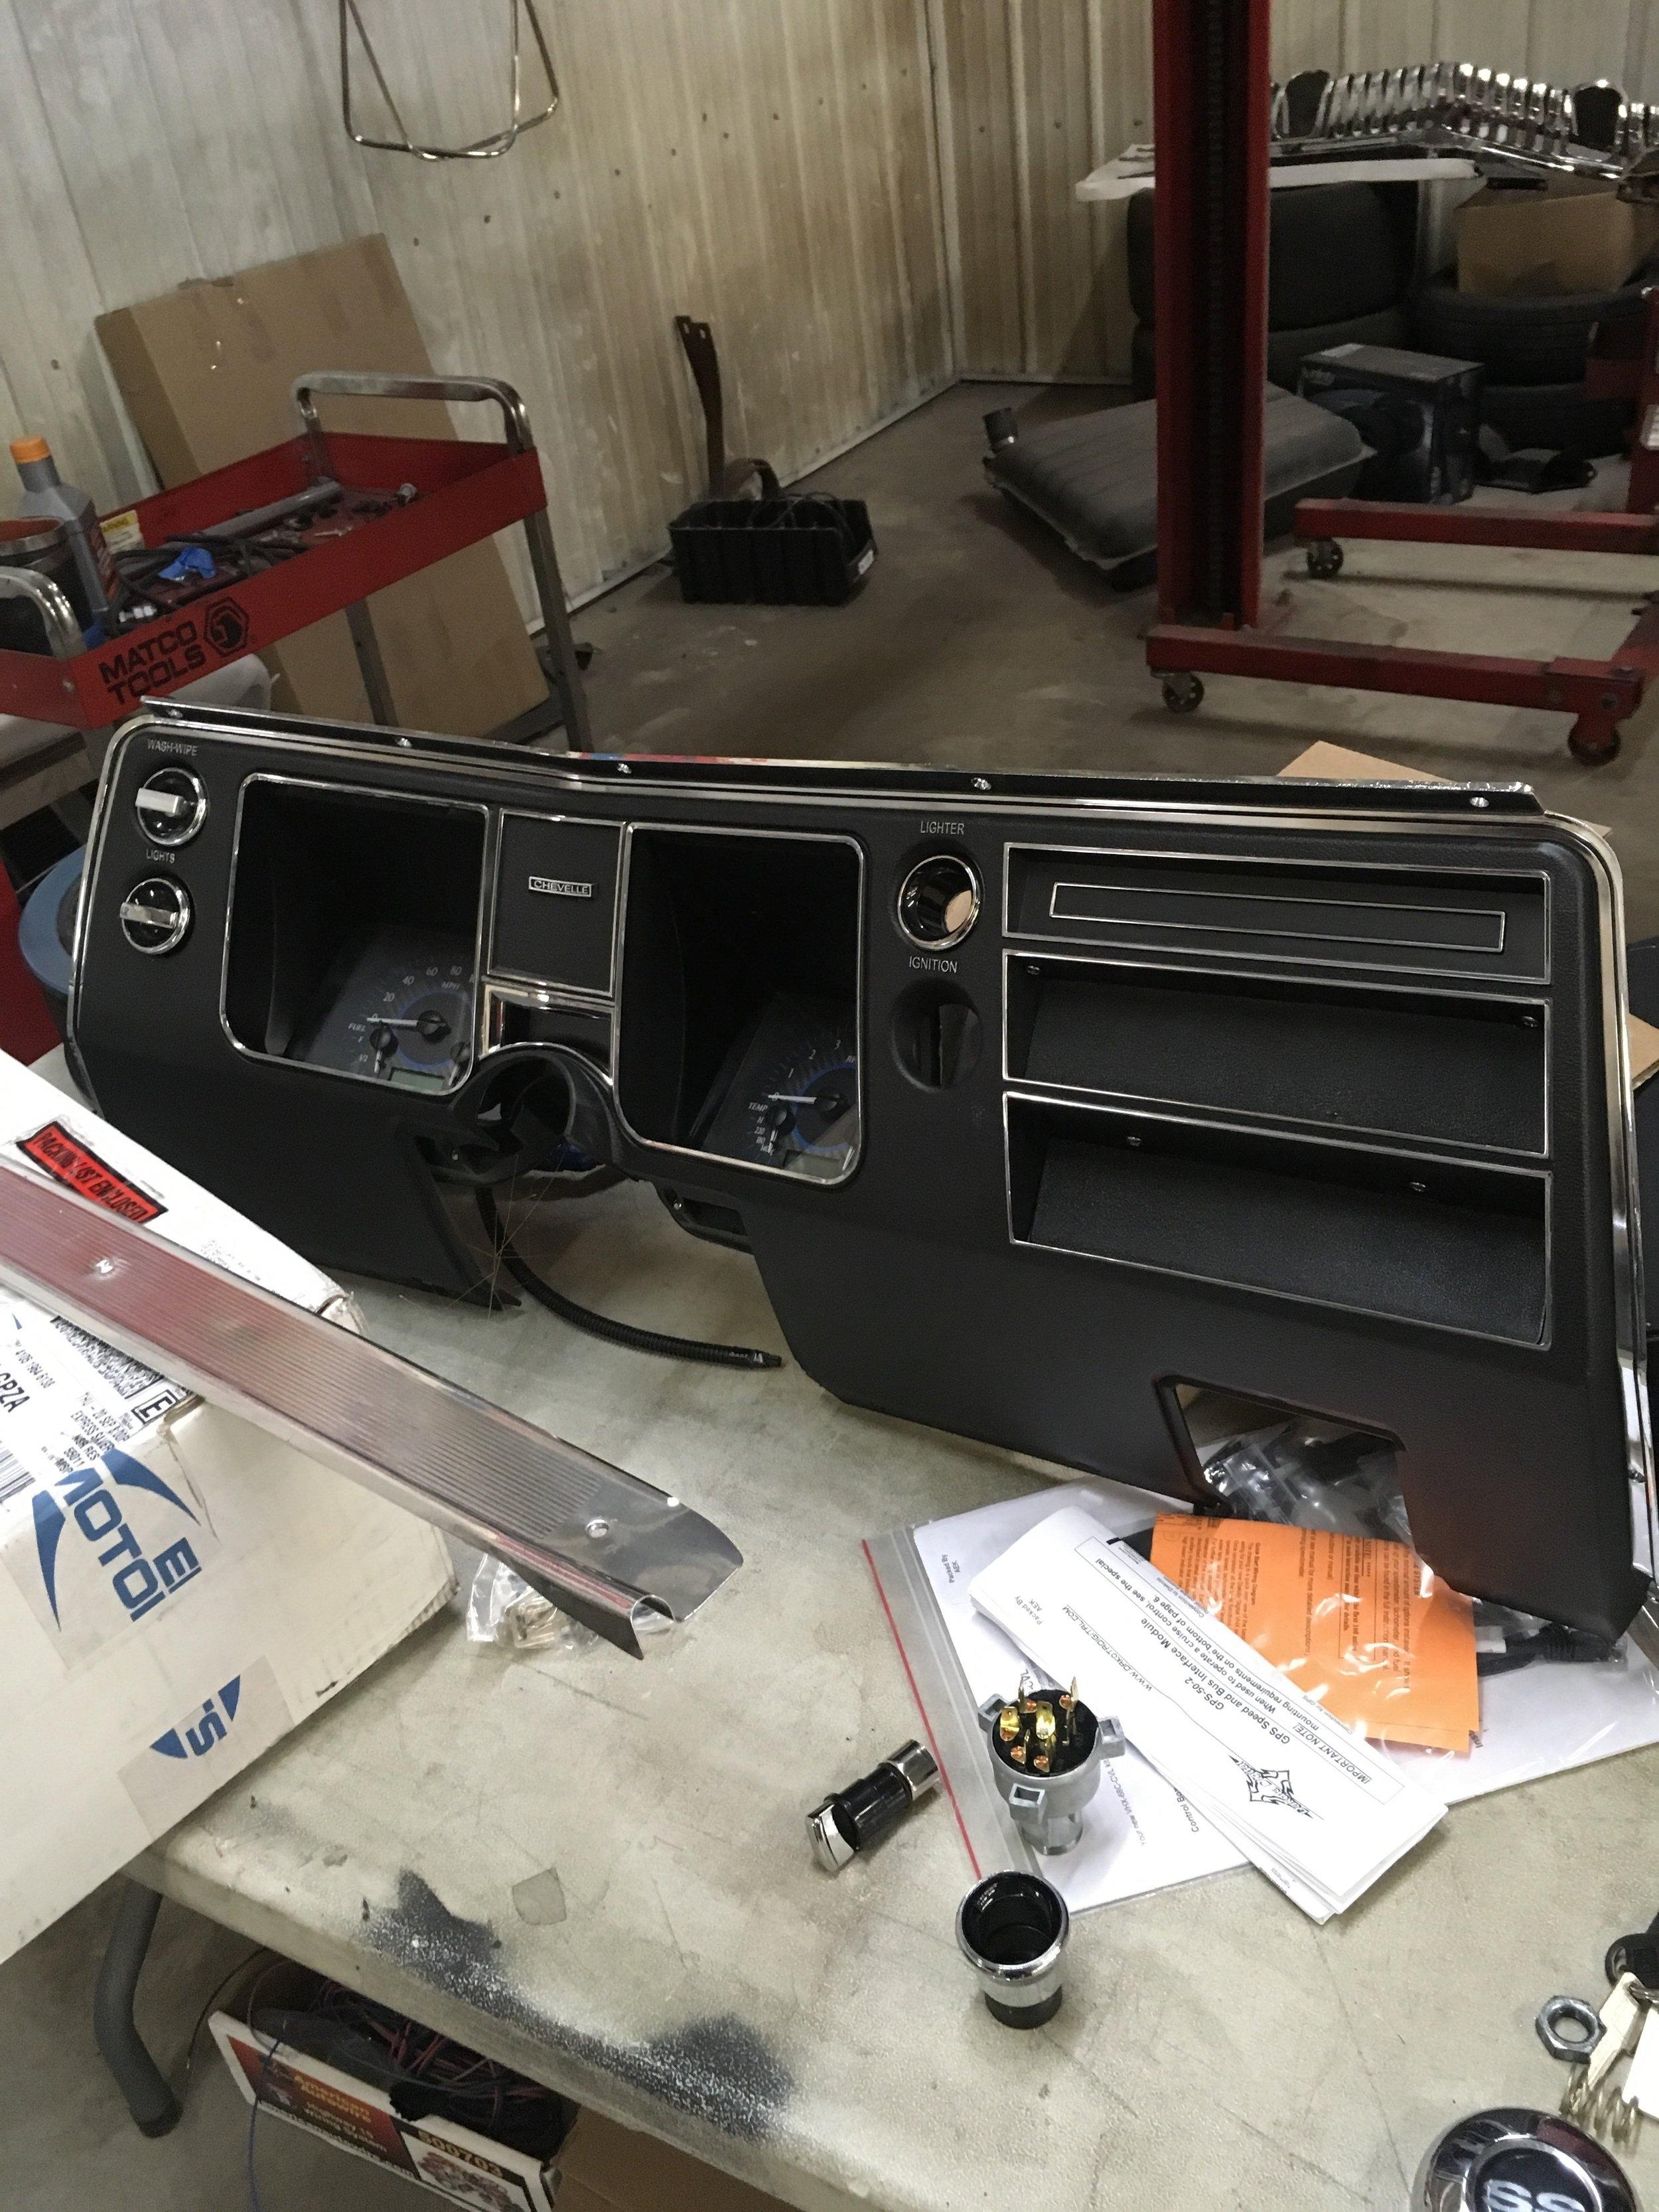 1968-chevelle-yenko-minneapolis-hot-rod-factory-car-restoration-dashboard.jpg